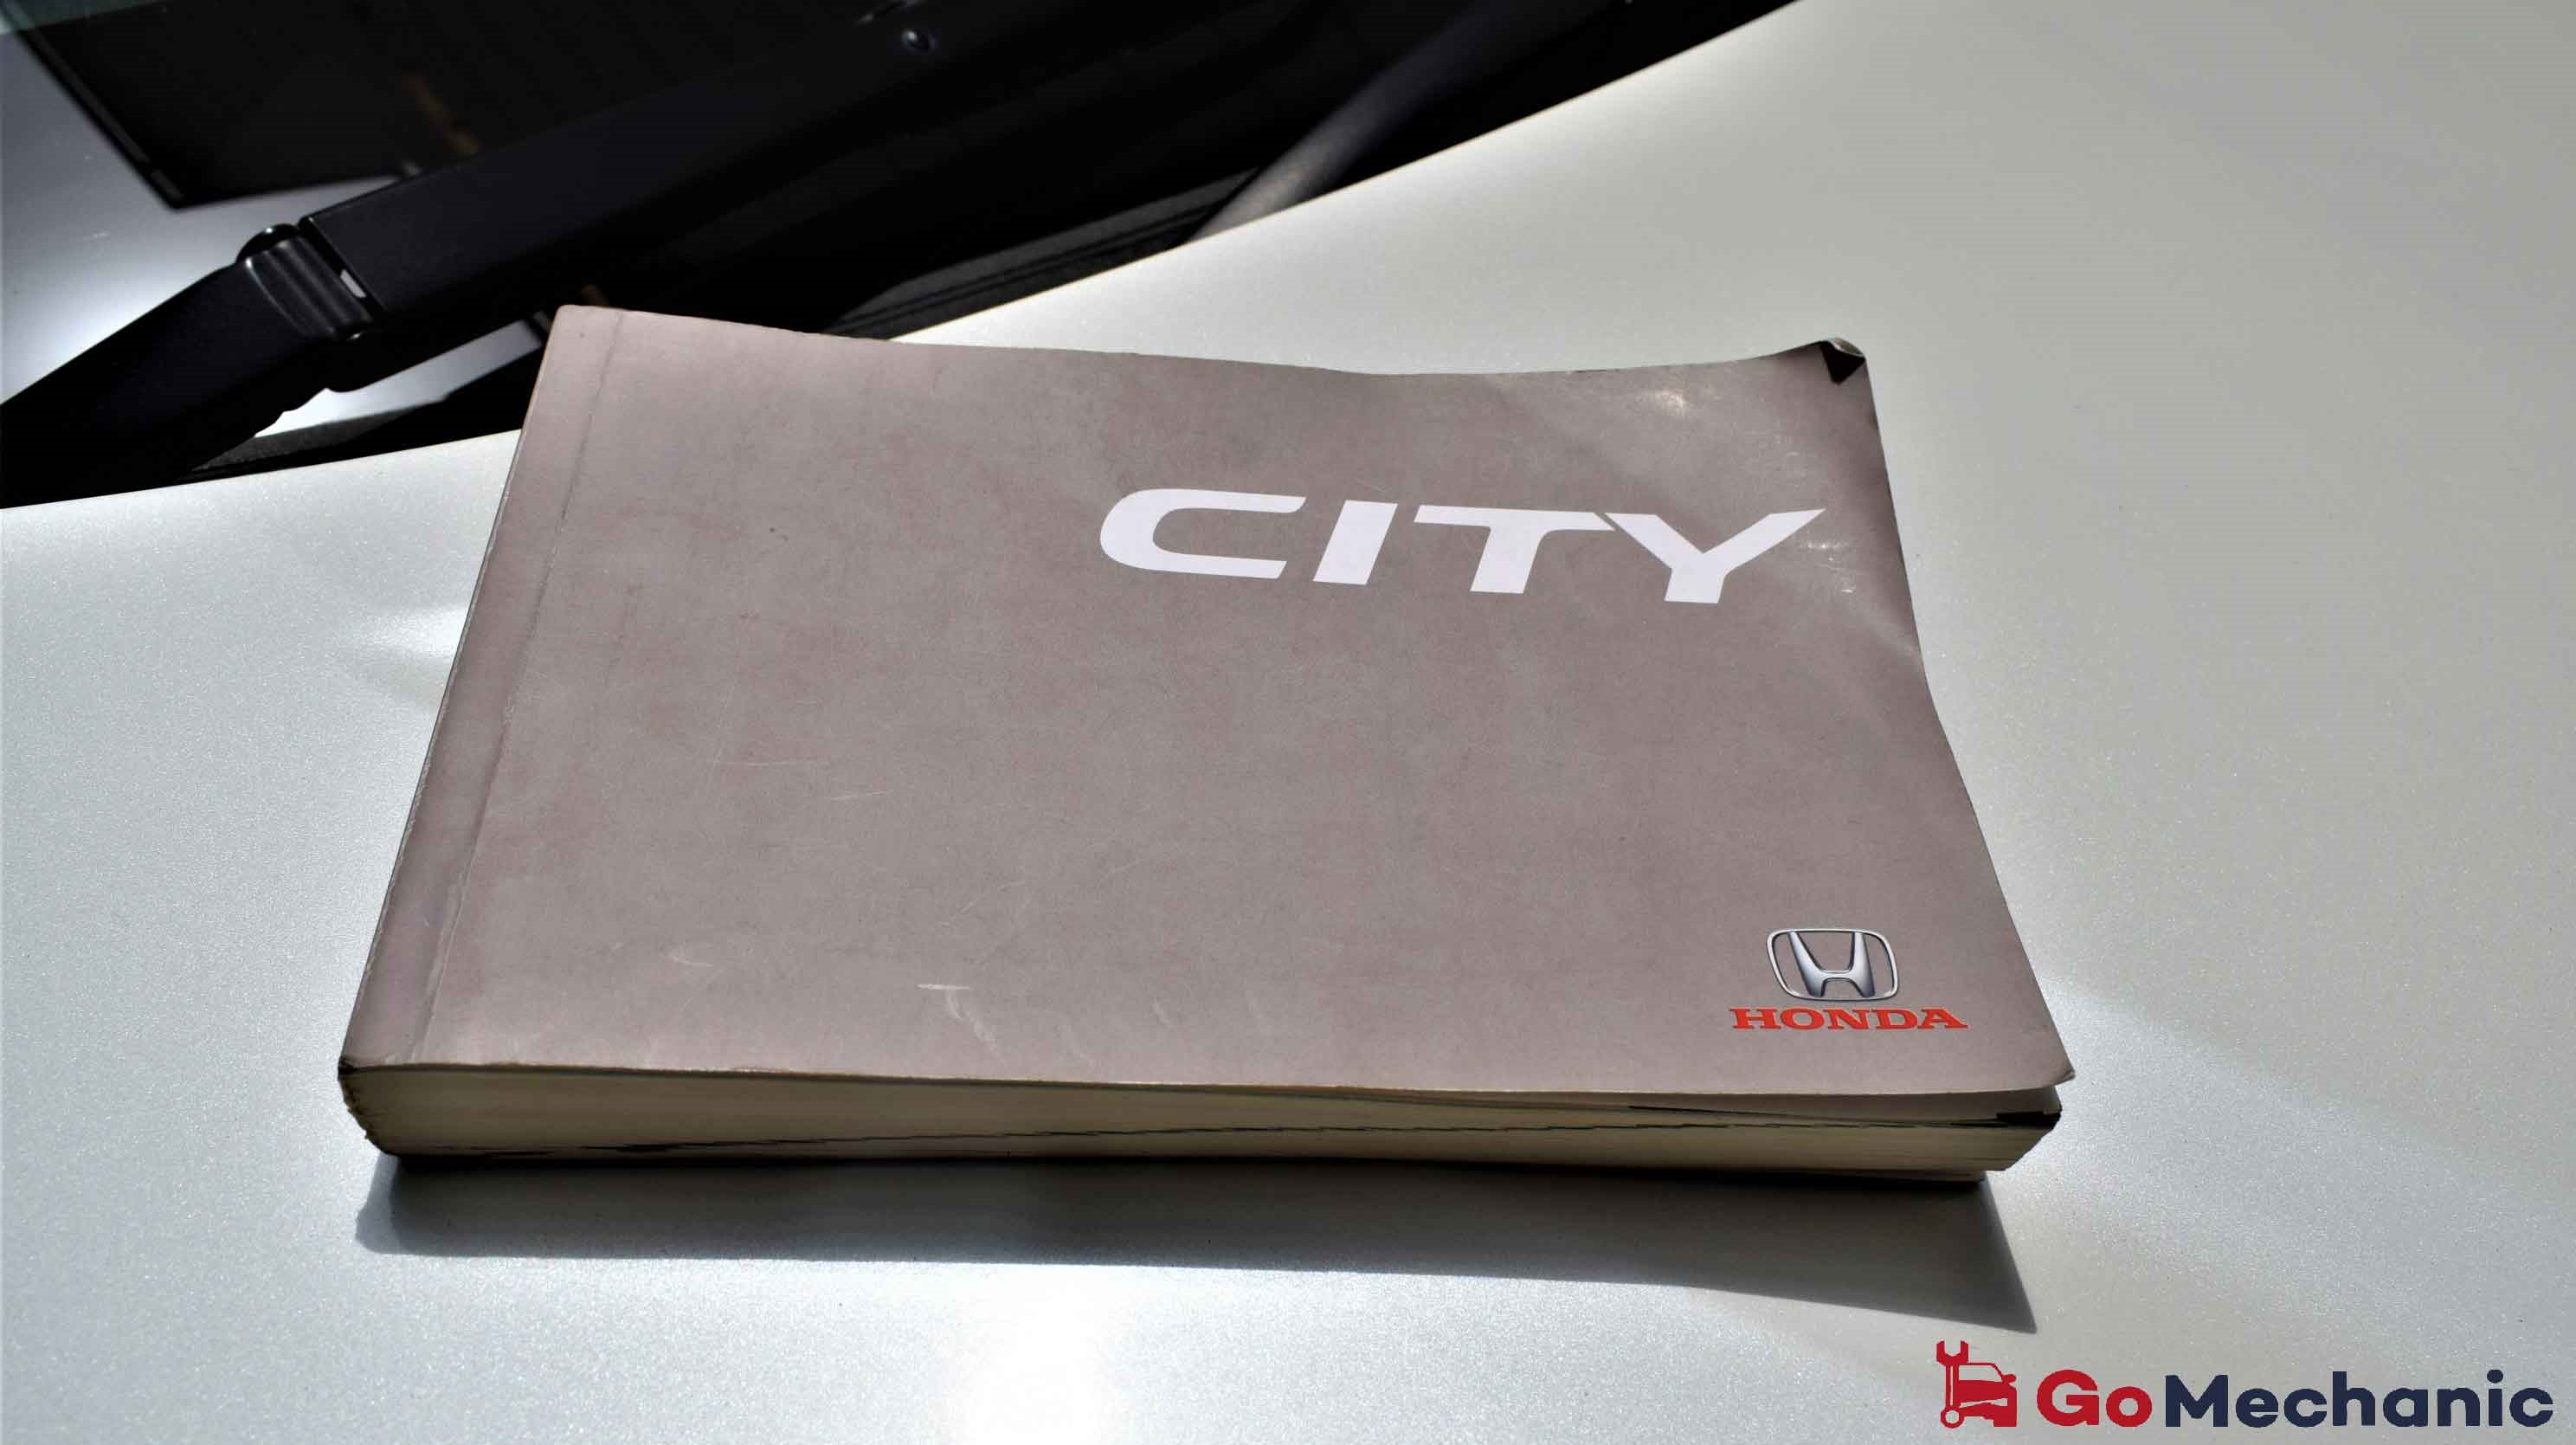 Honda City Owner's Manual for Preventive Maintenance